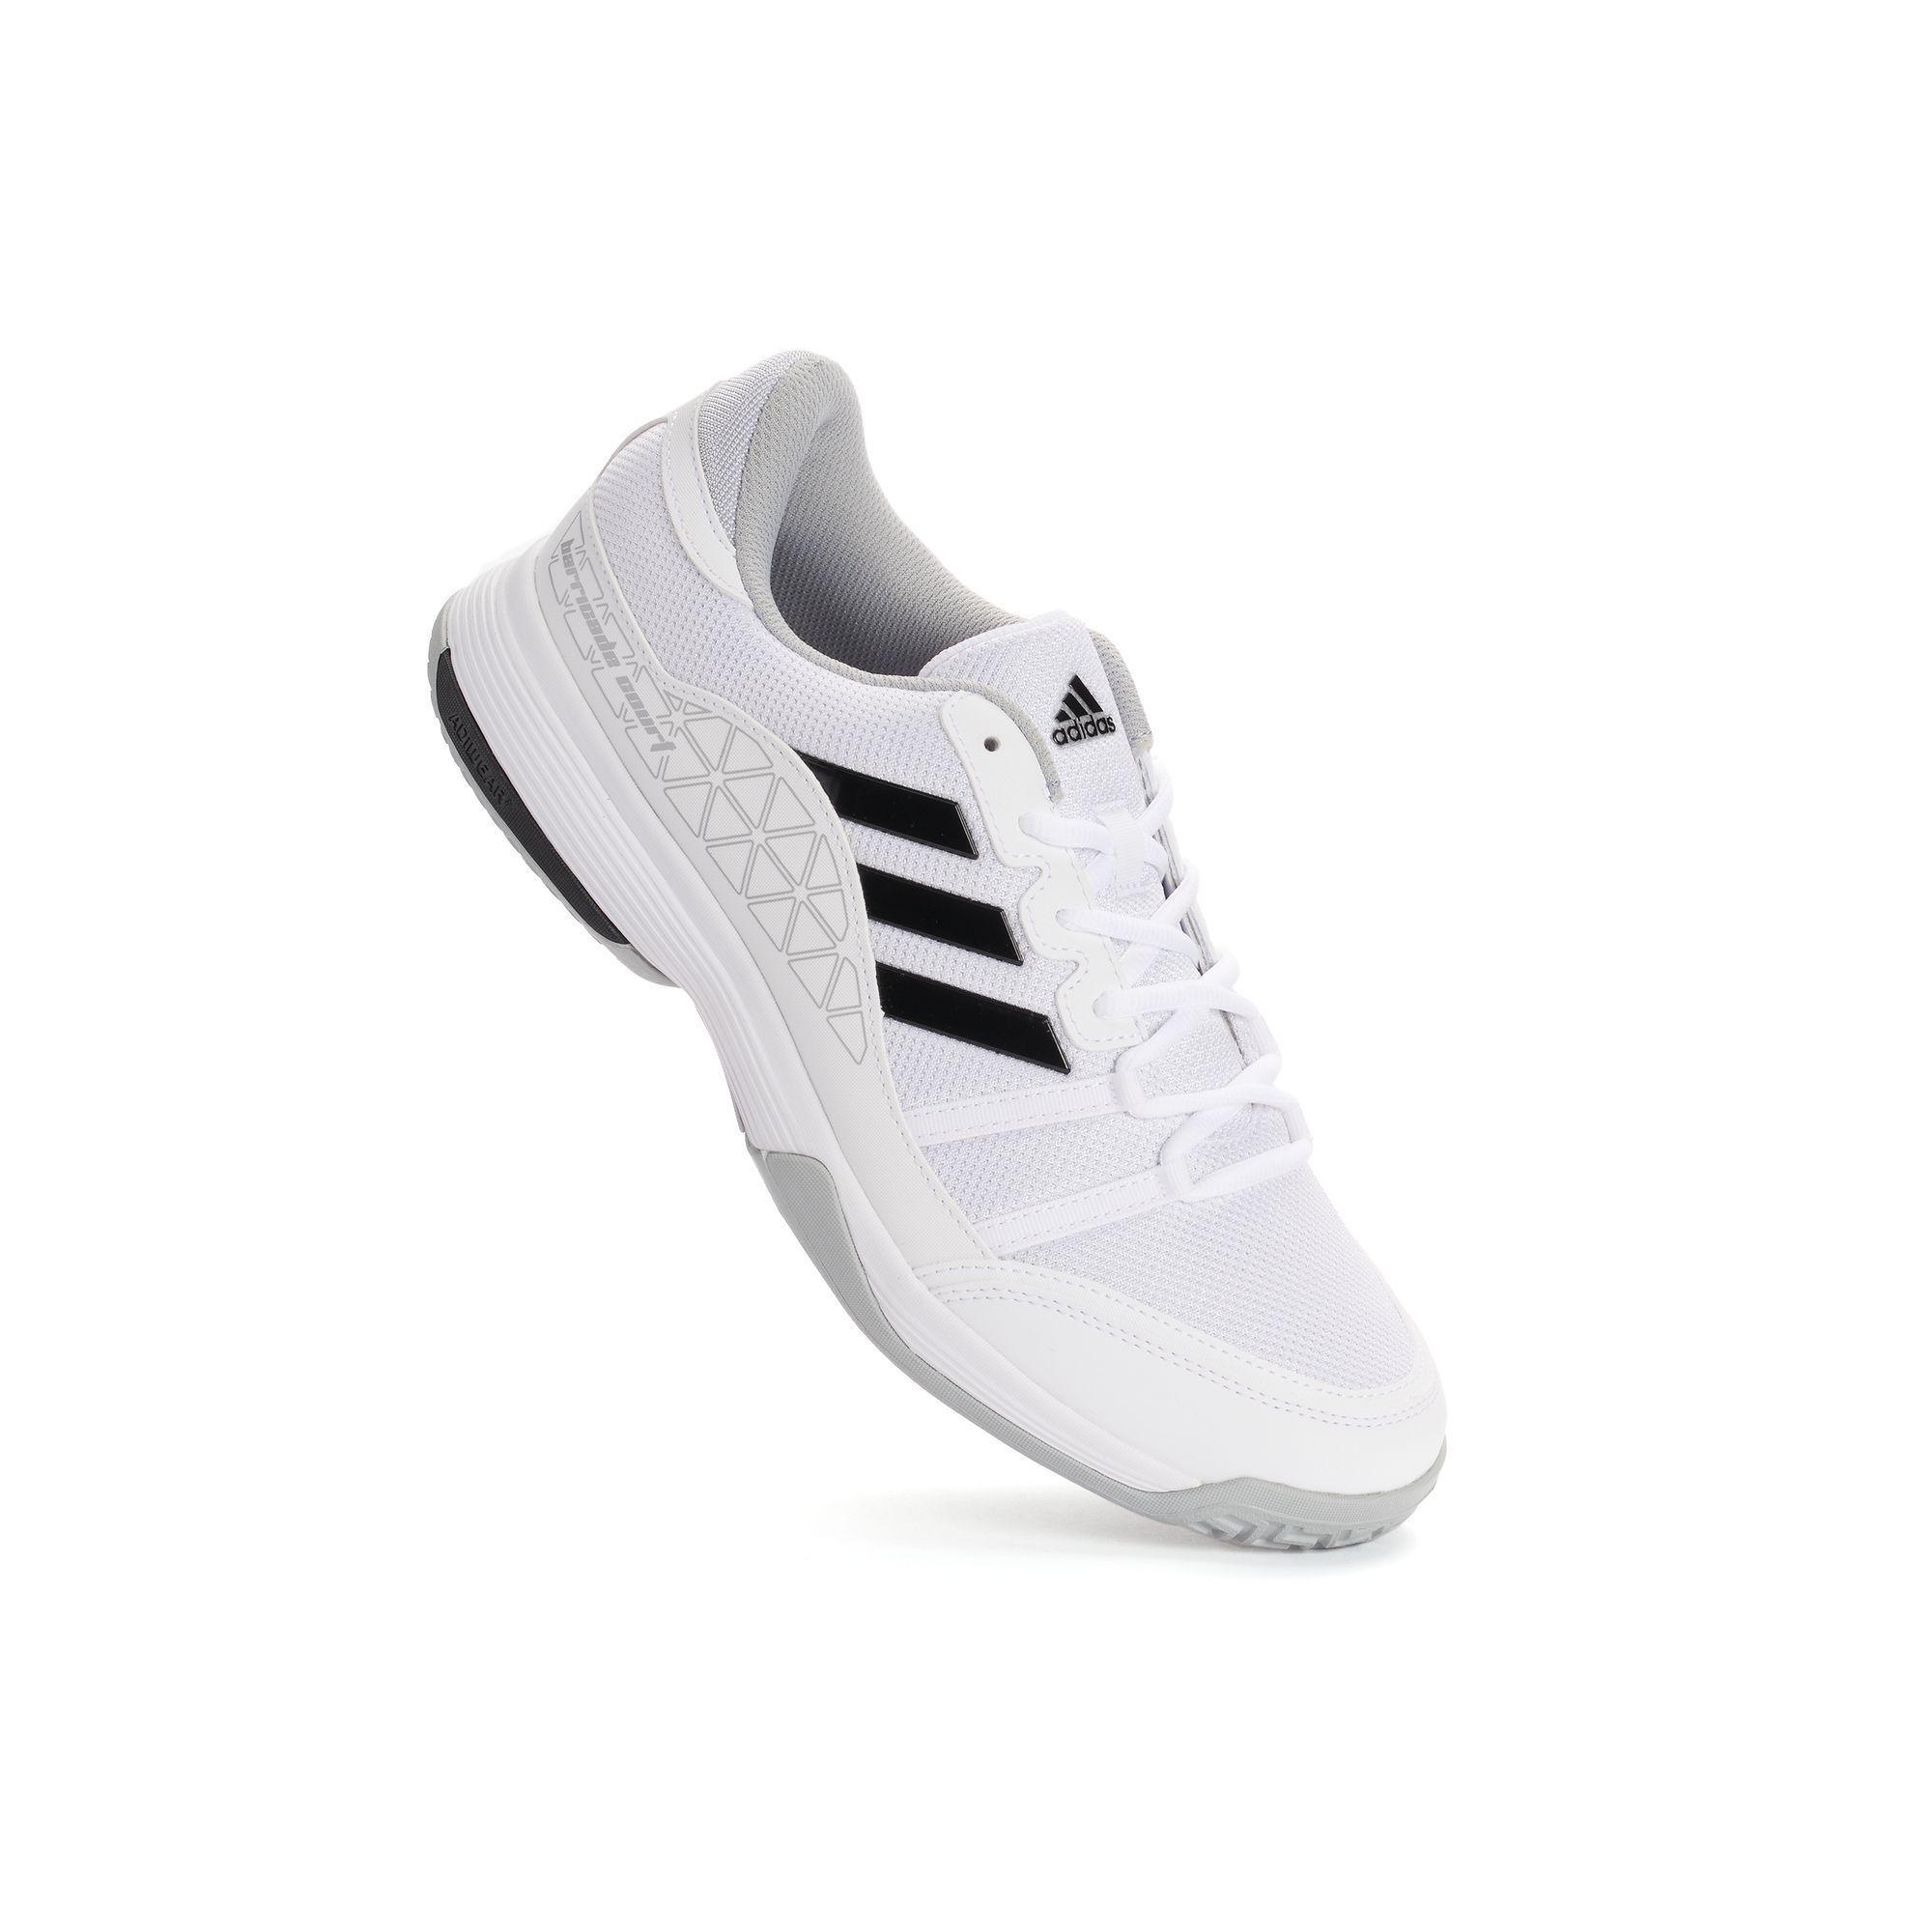 Adidas Barricade Court Wide Men's Tennis Shoes, Size: 11.5 Wide, ...